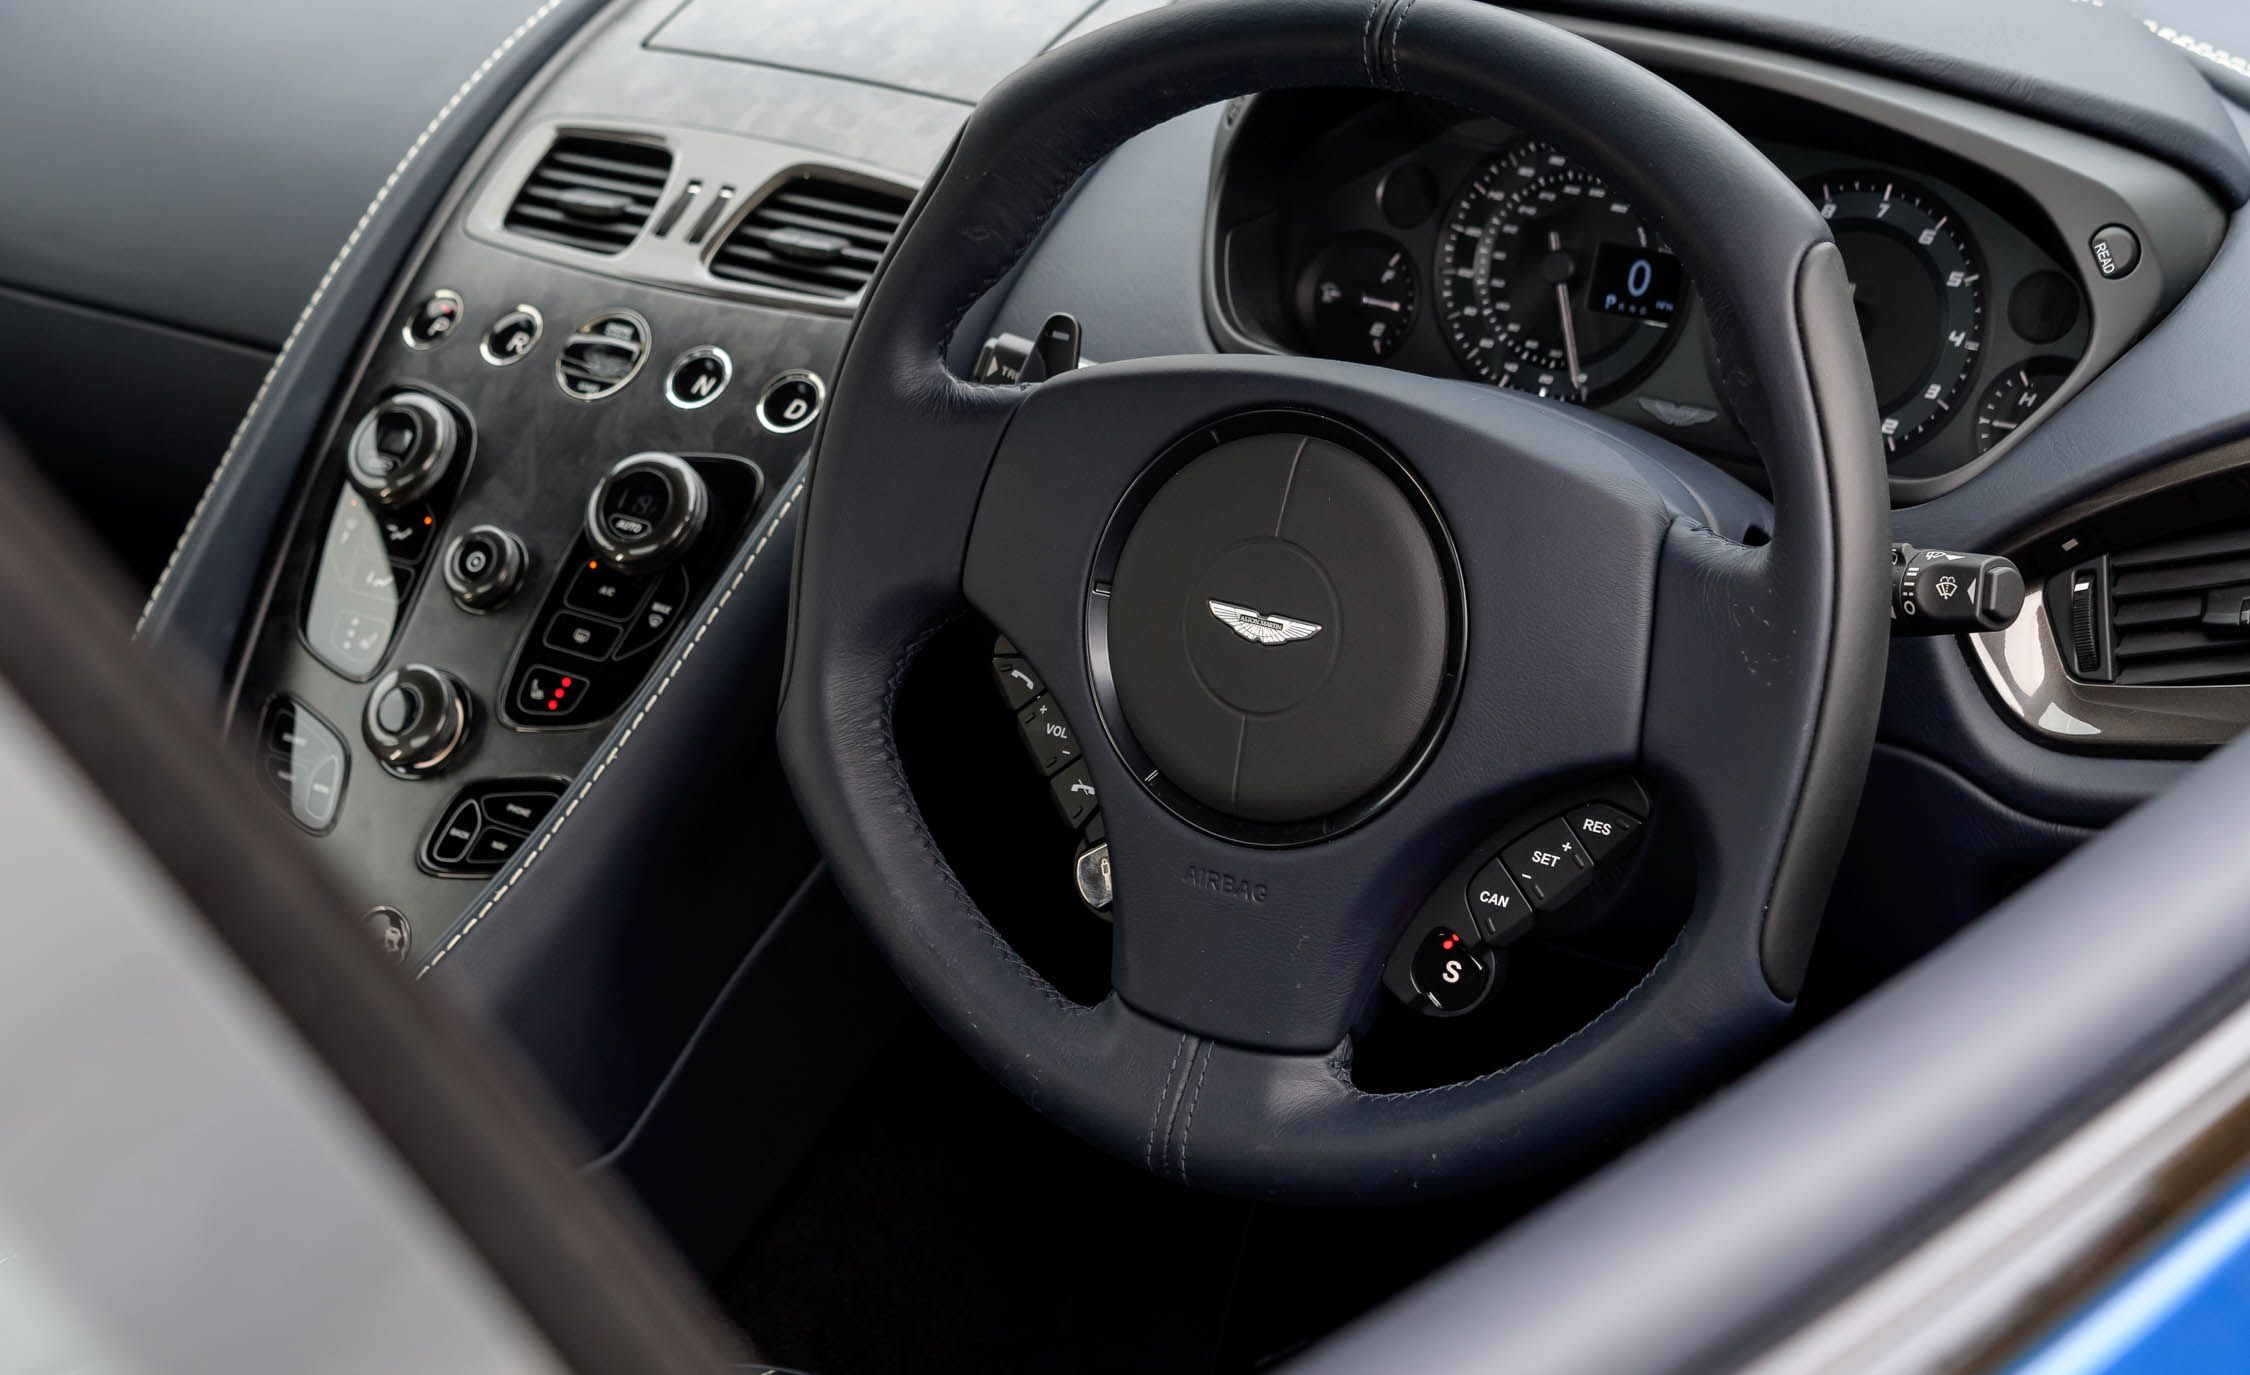 2019 Aston Martin Vanquish Reviews Aston Martin Vanquish Price